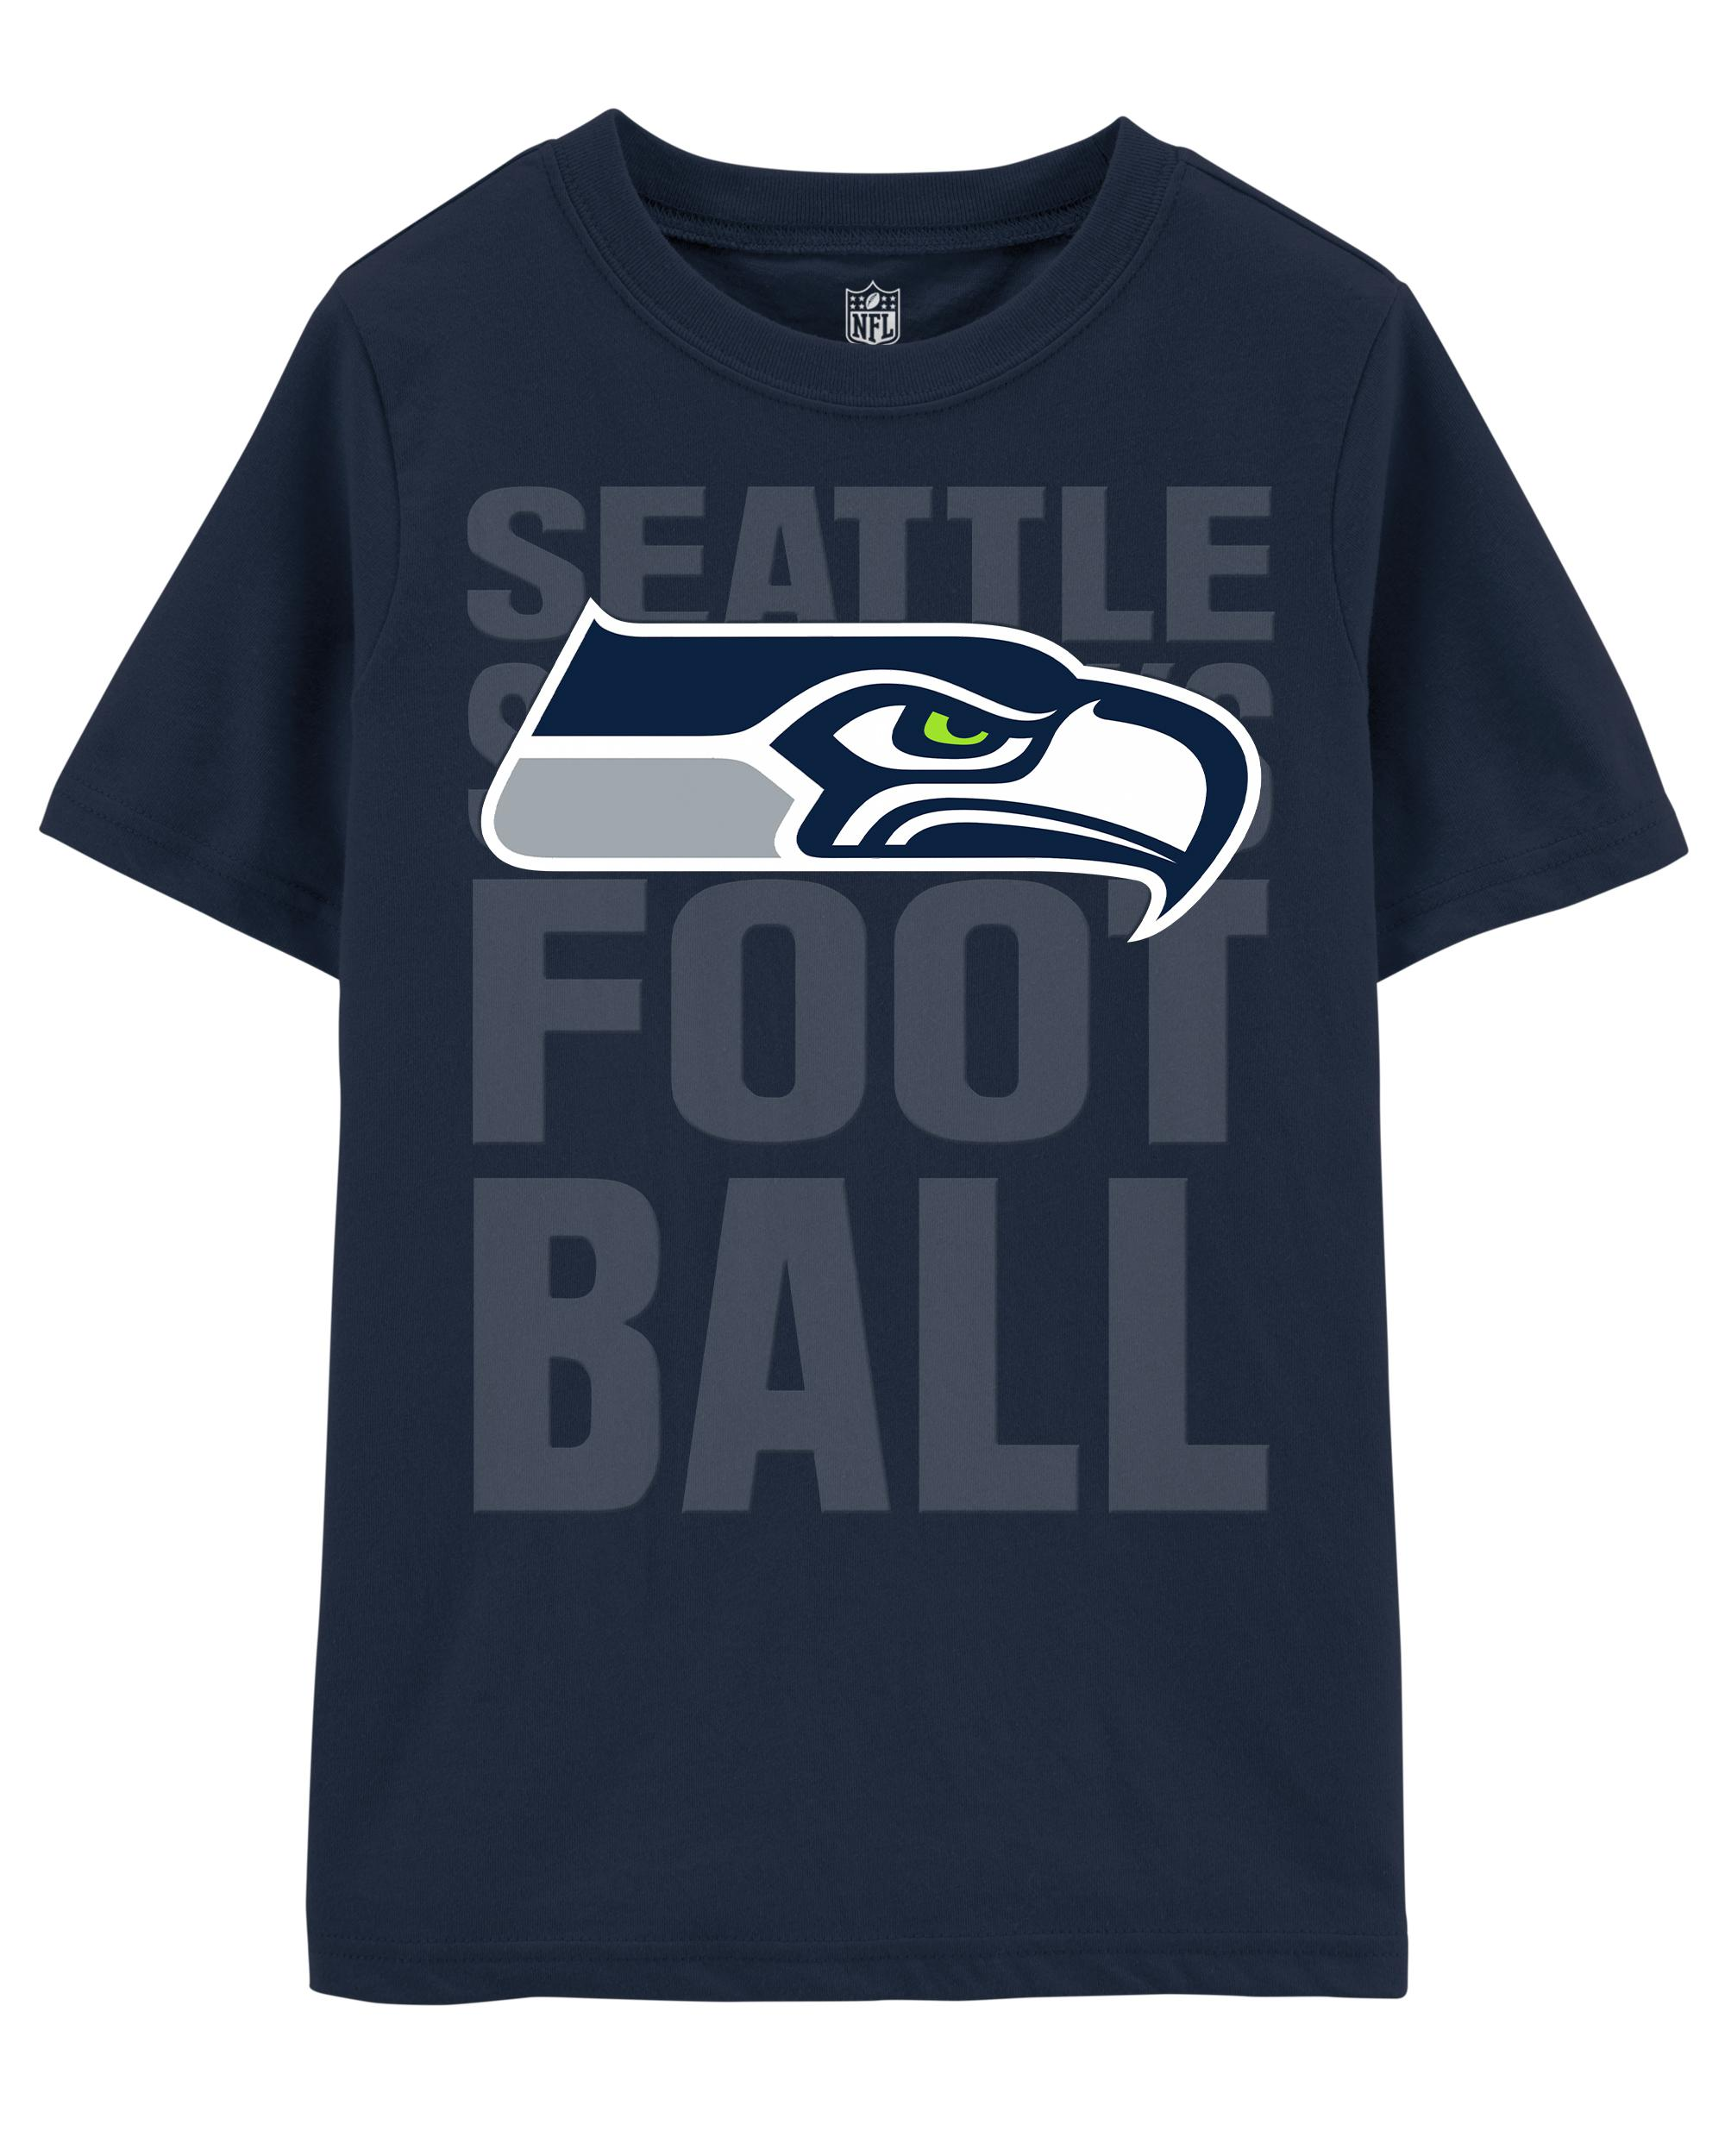 8106a8d7 NFL Seattle Seahawks Tee   carters.com